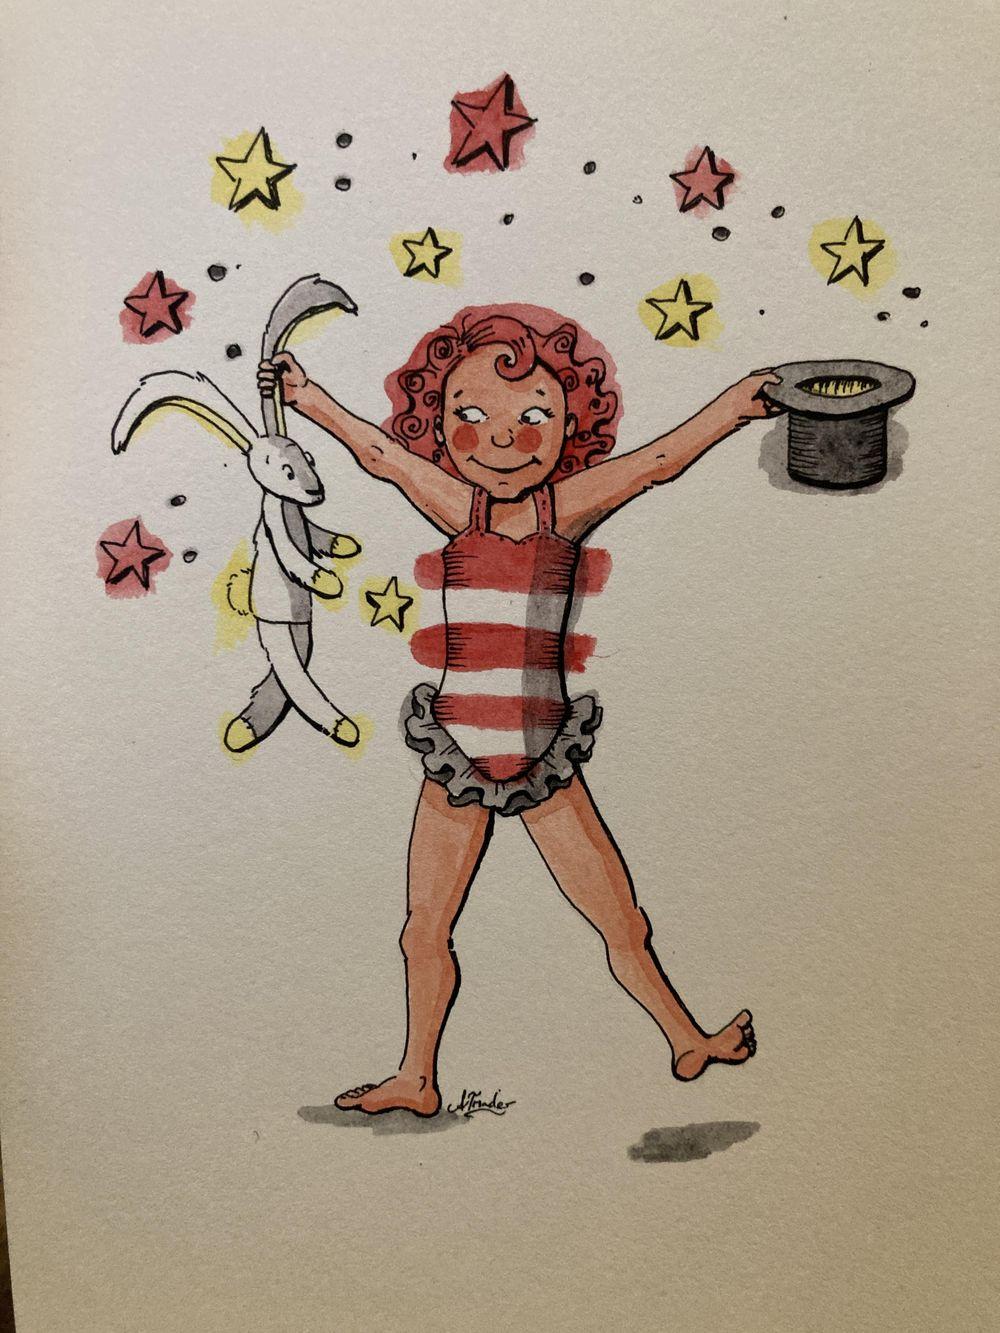 Watercolour magic: circus girl 5 ways! - image 4 - student project